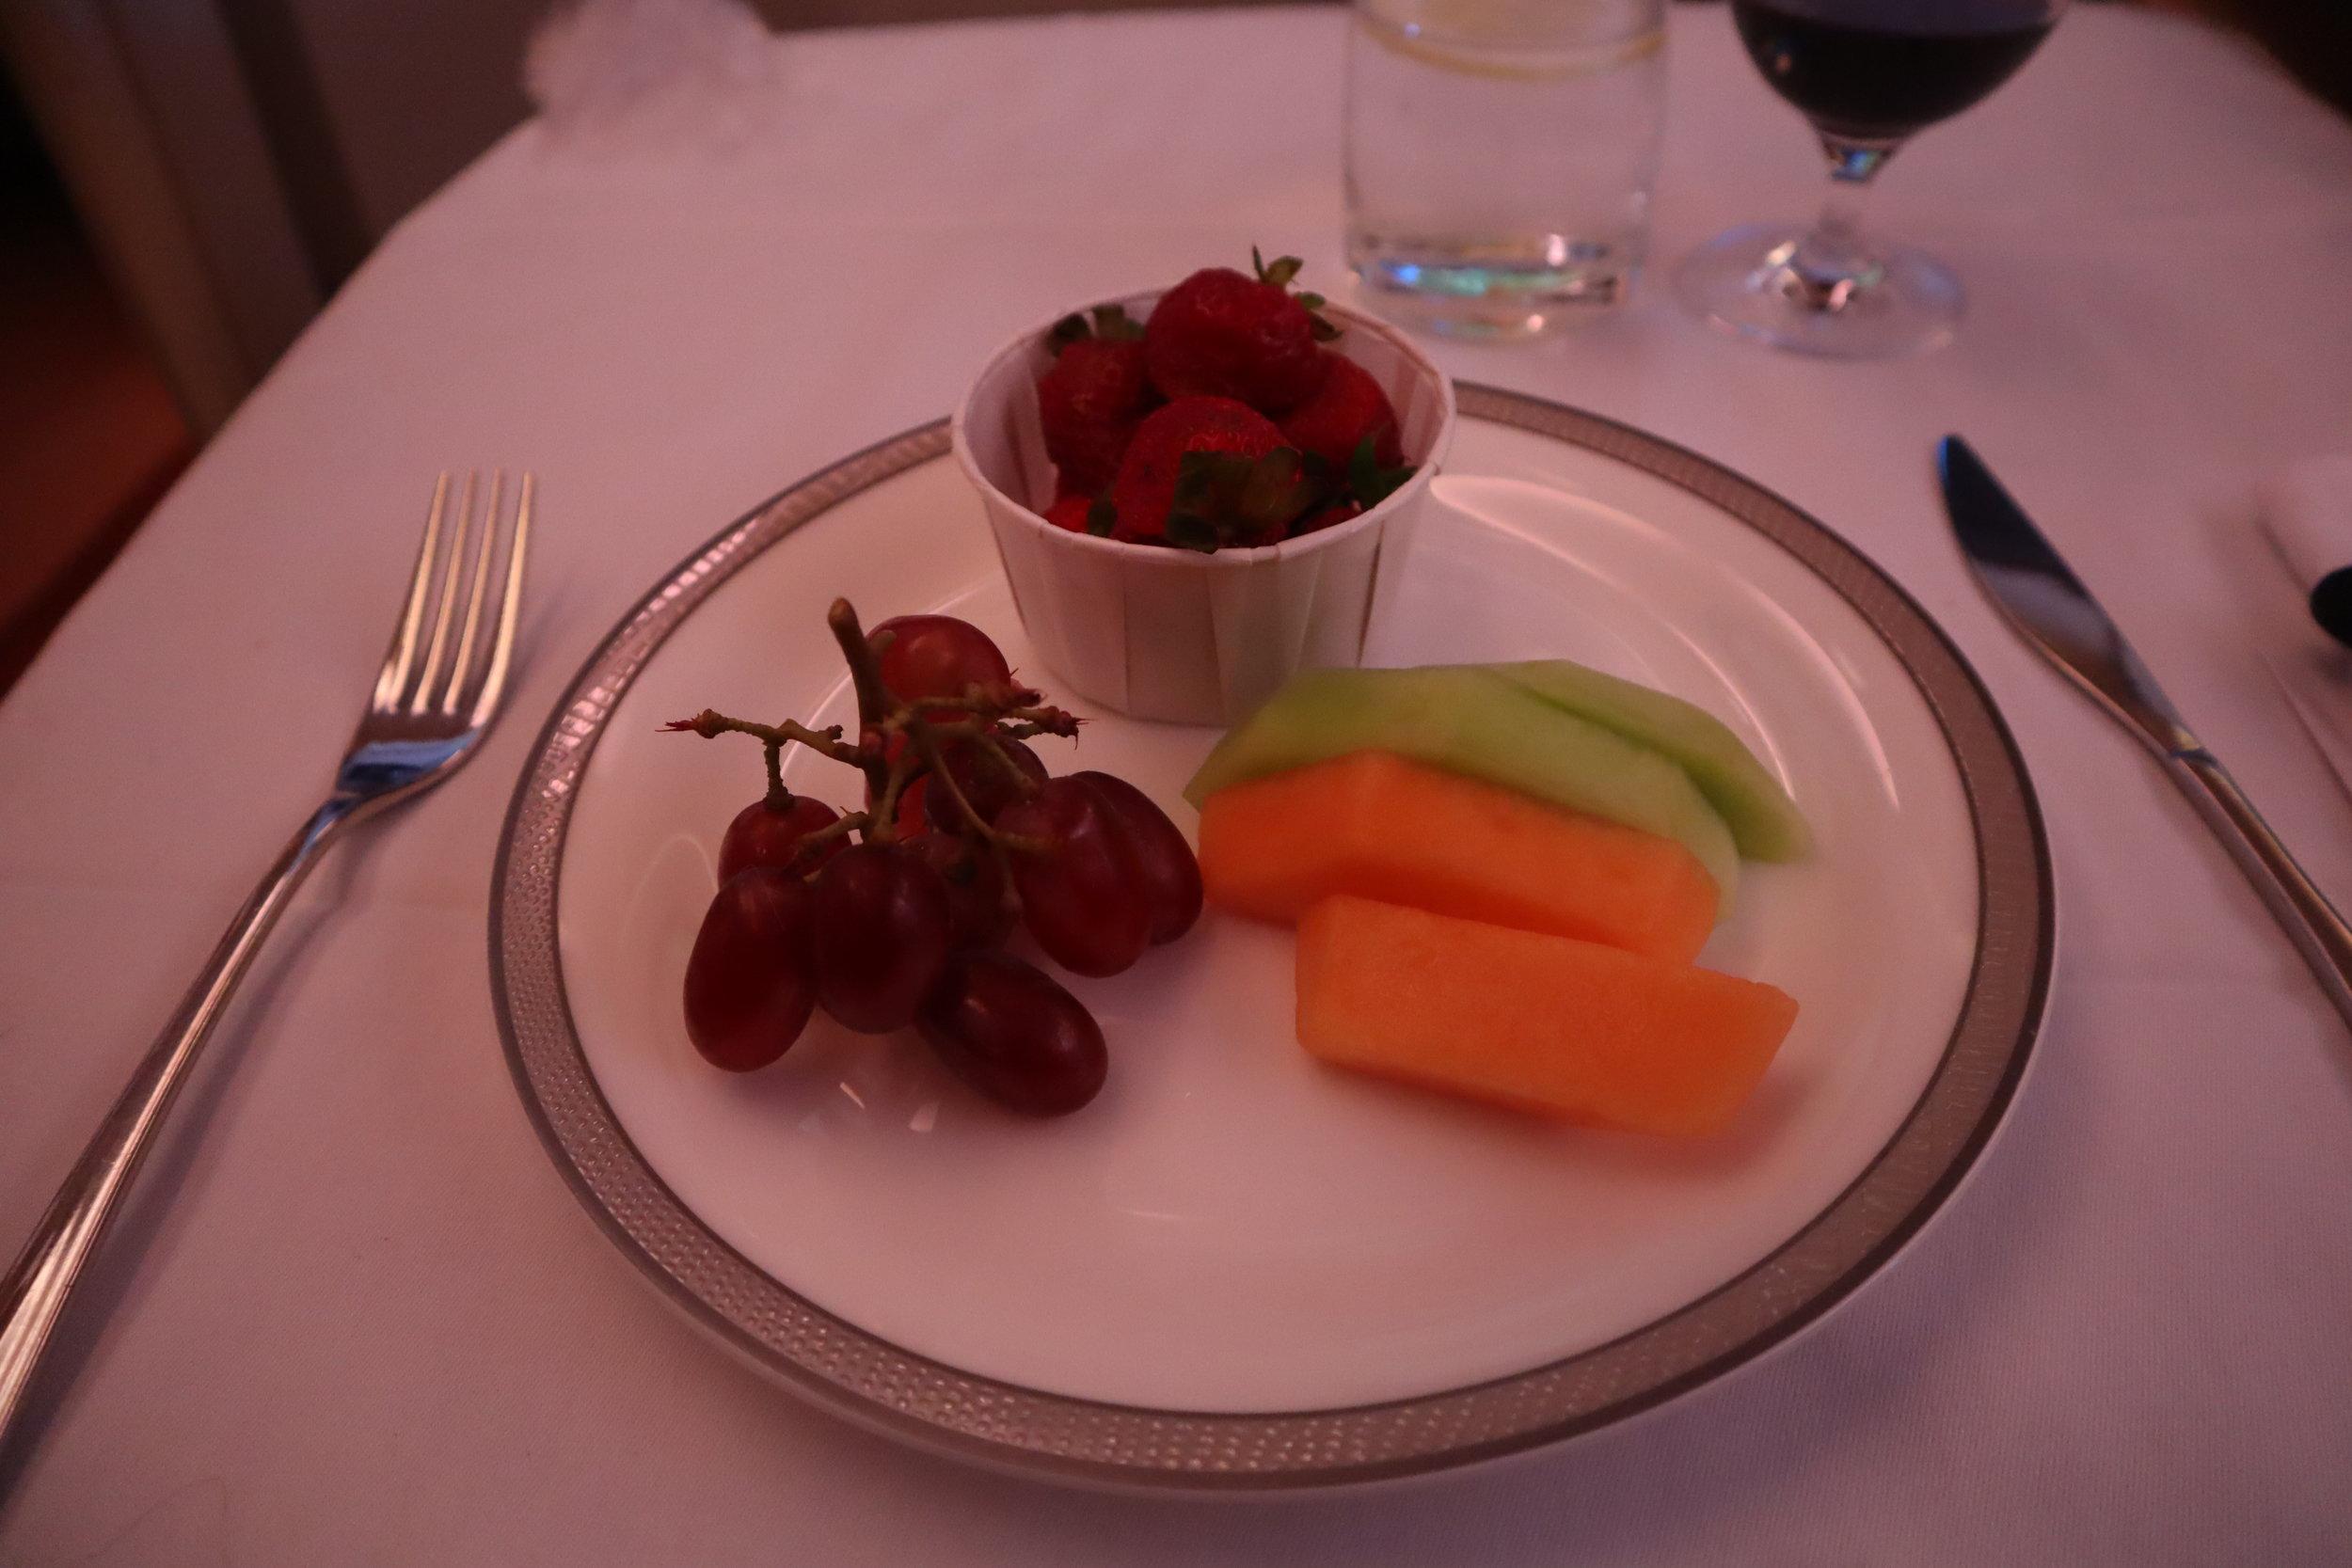 Singapore Airlines Suites Class – Fresh fruit